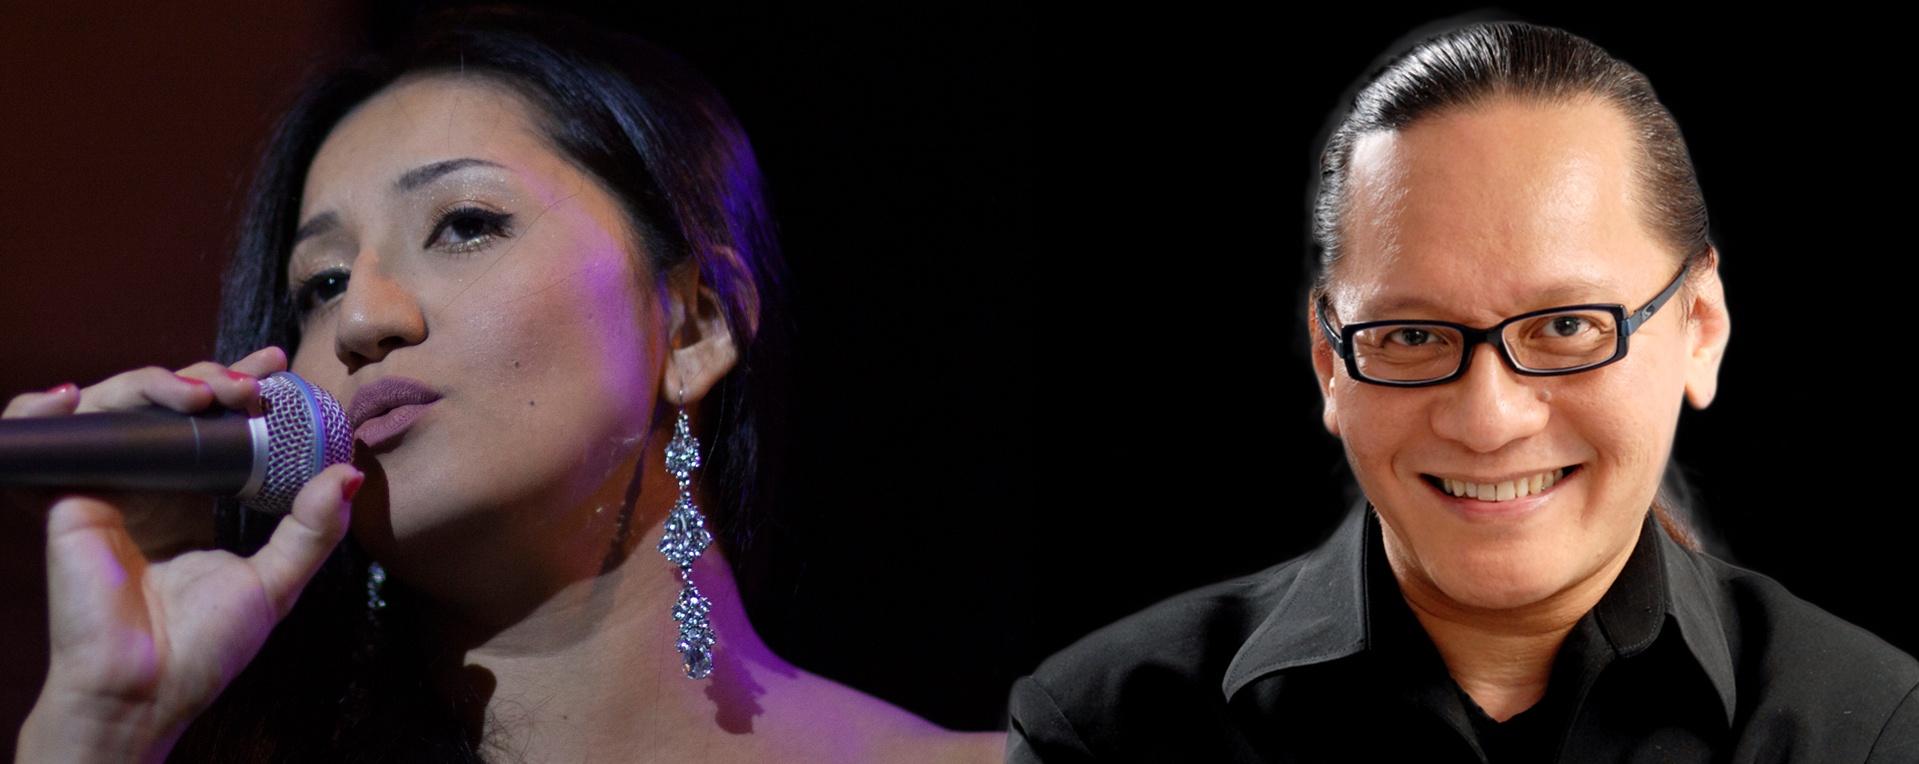 Beverly Morata and Mario Serio